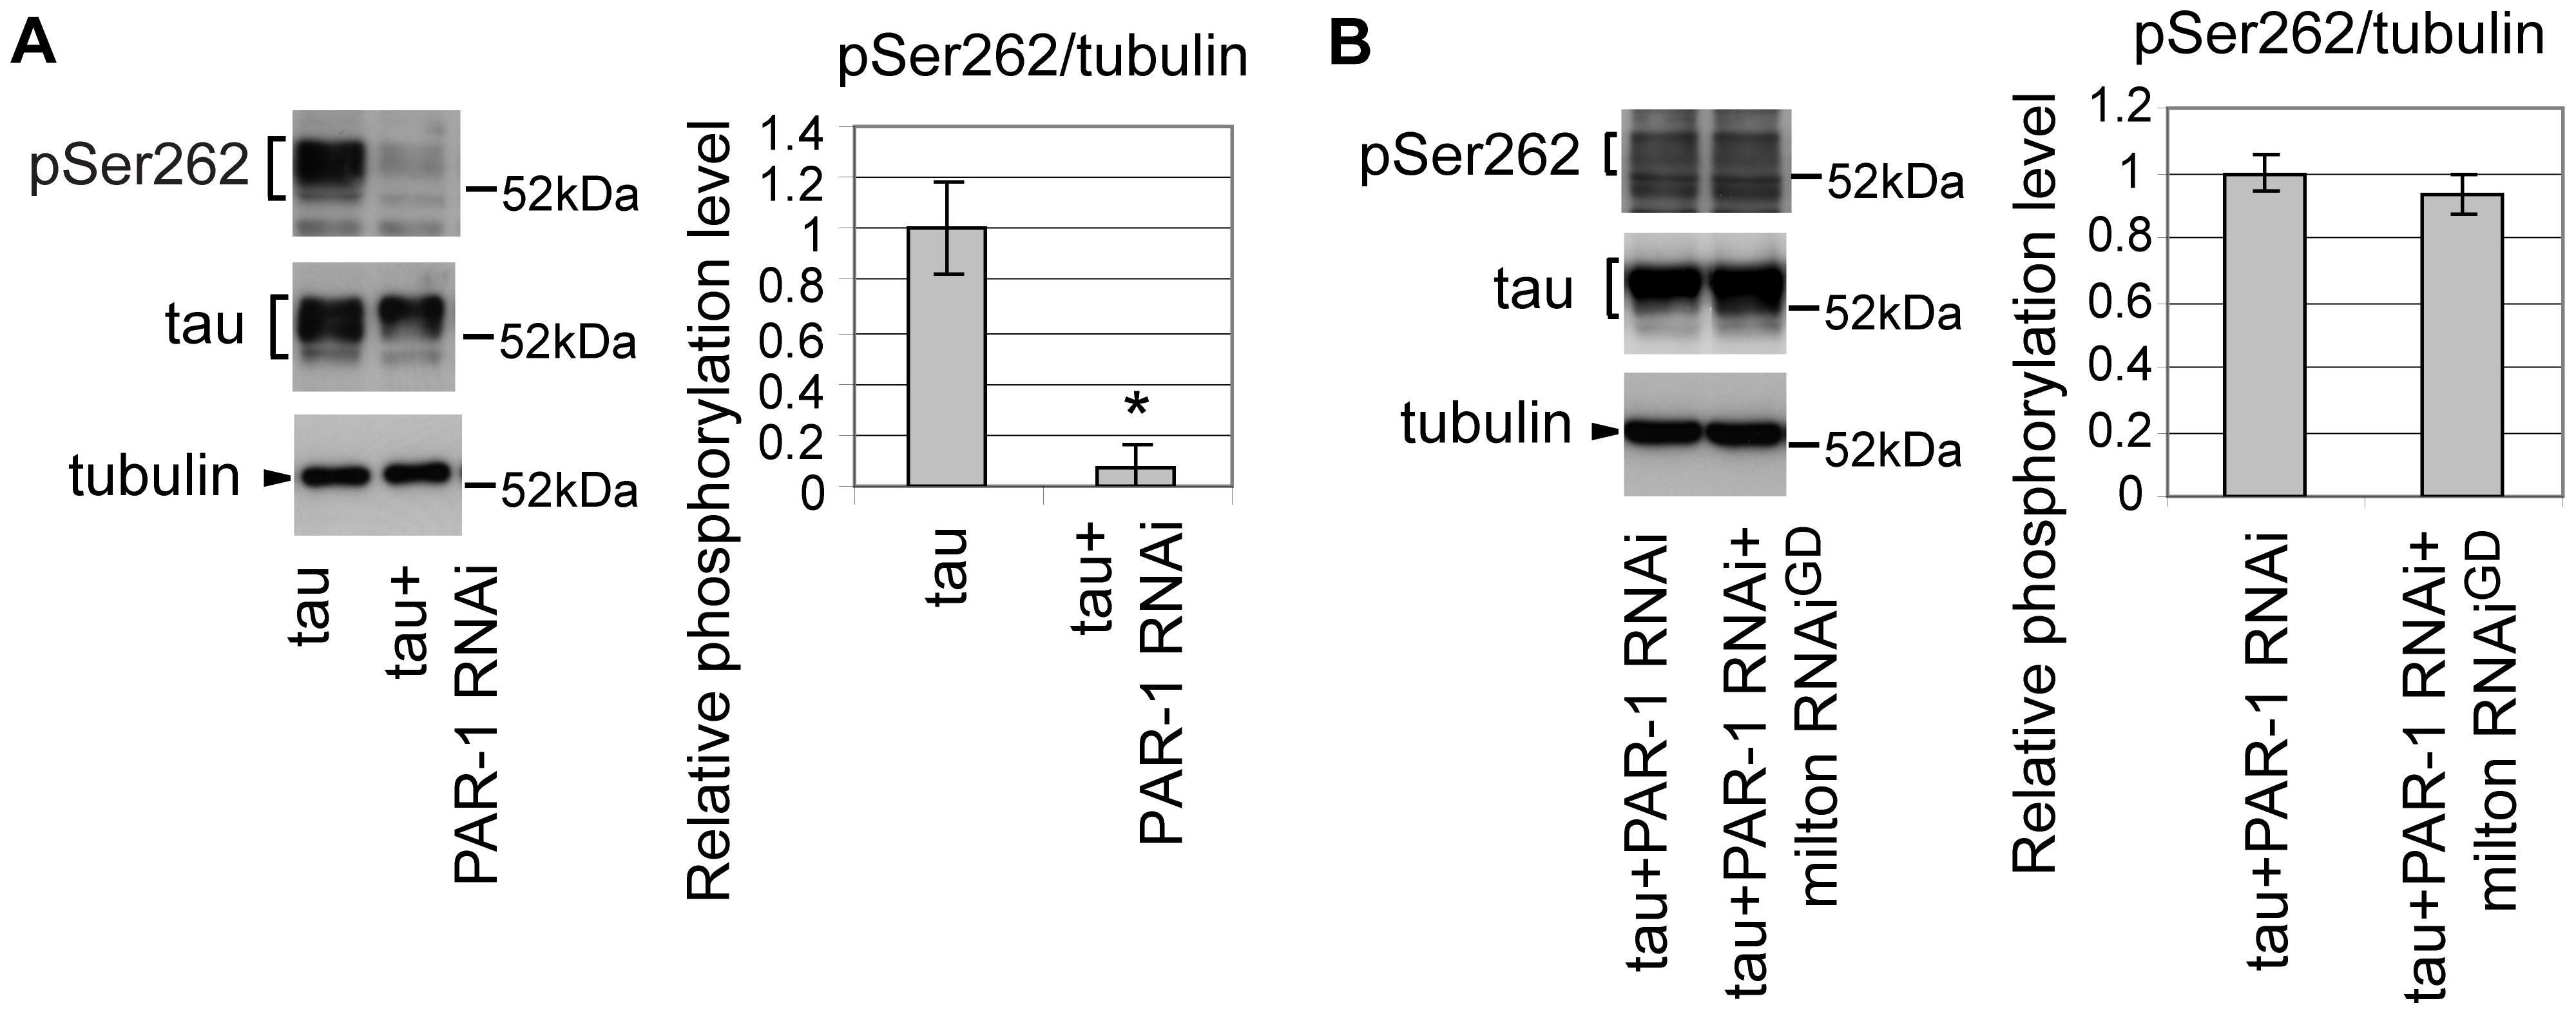 PAR-1 mediates the increase in tau phosphorylation at Ser262 caused by milton knockdown.